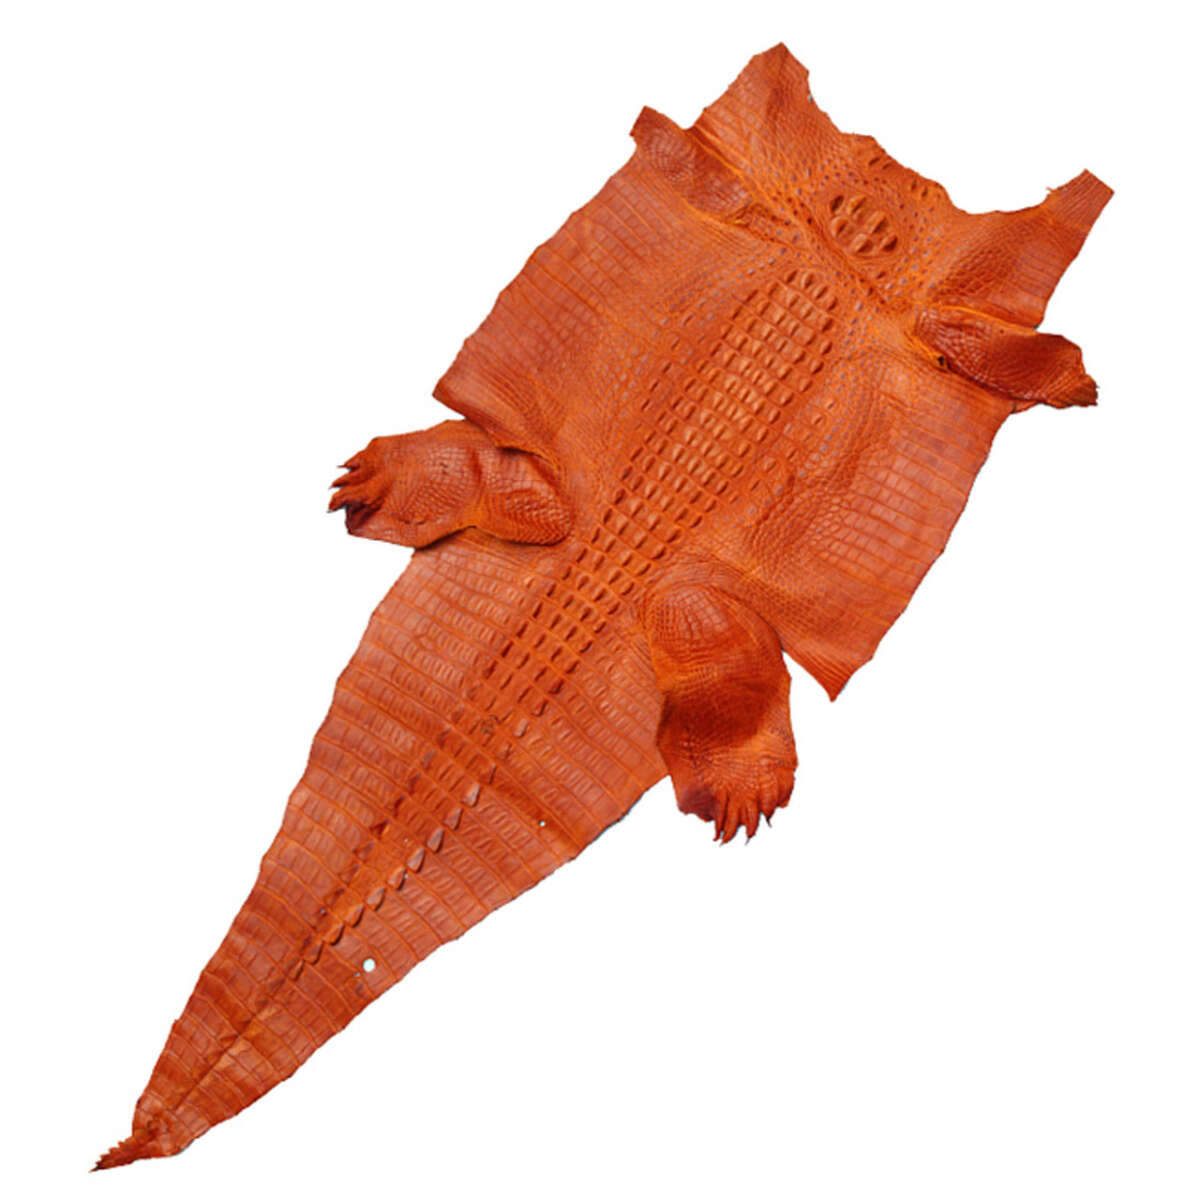 Da cá sấu thuộc S1221b